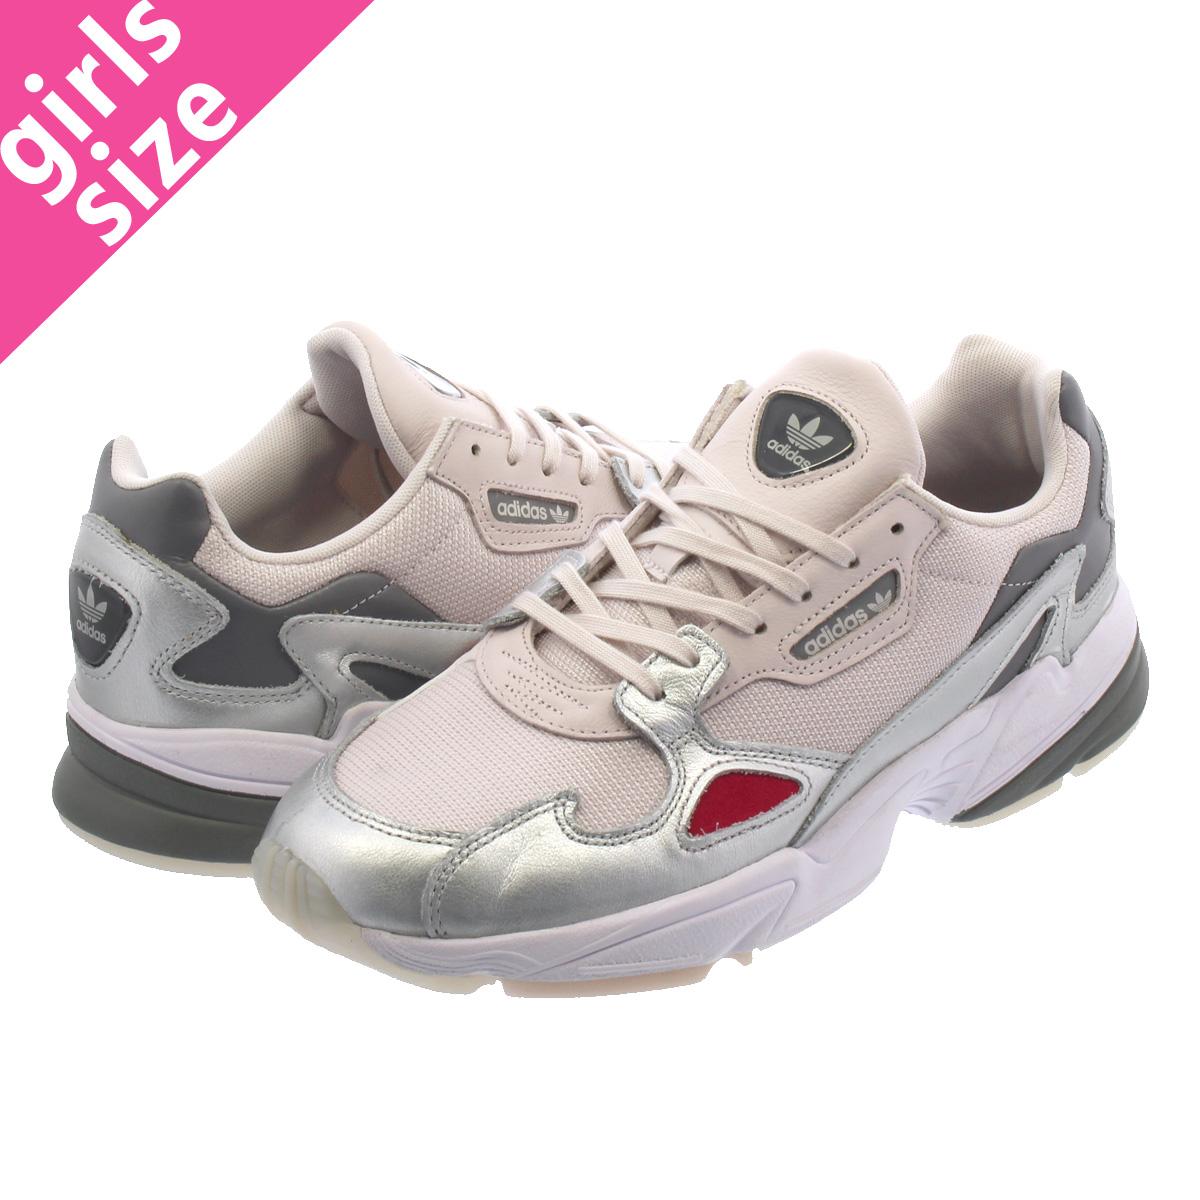 quality design 9be42 a5c62 adidas ADIDASFALCON W LL Adidas Adidas falcon women LL ORCHID TINTORCHID  TINTSILVER MET d96757